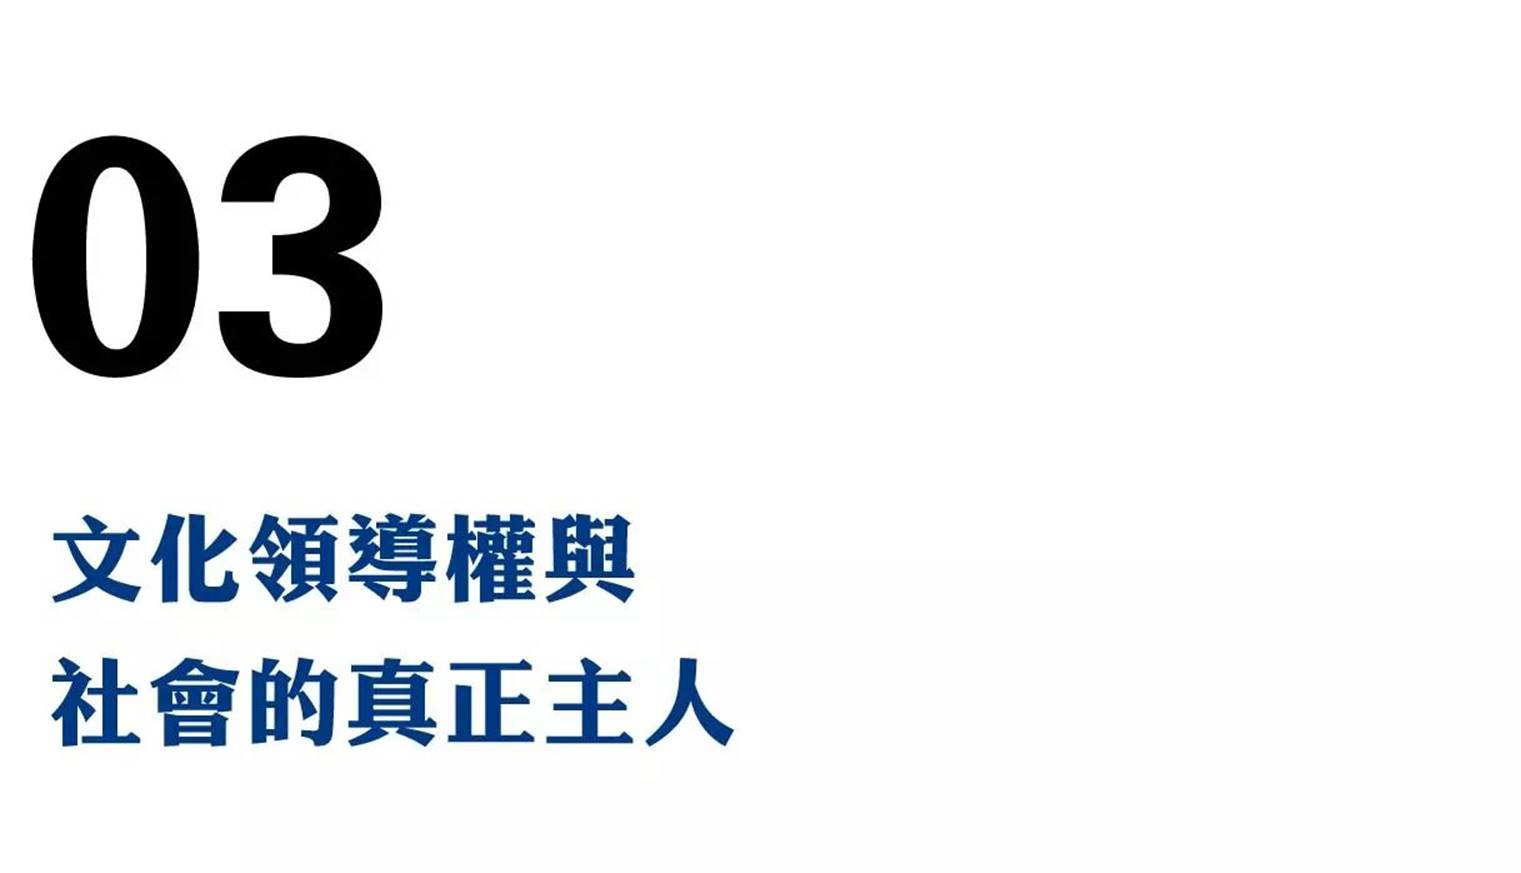 image032.jpg